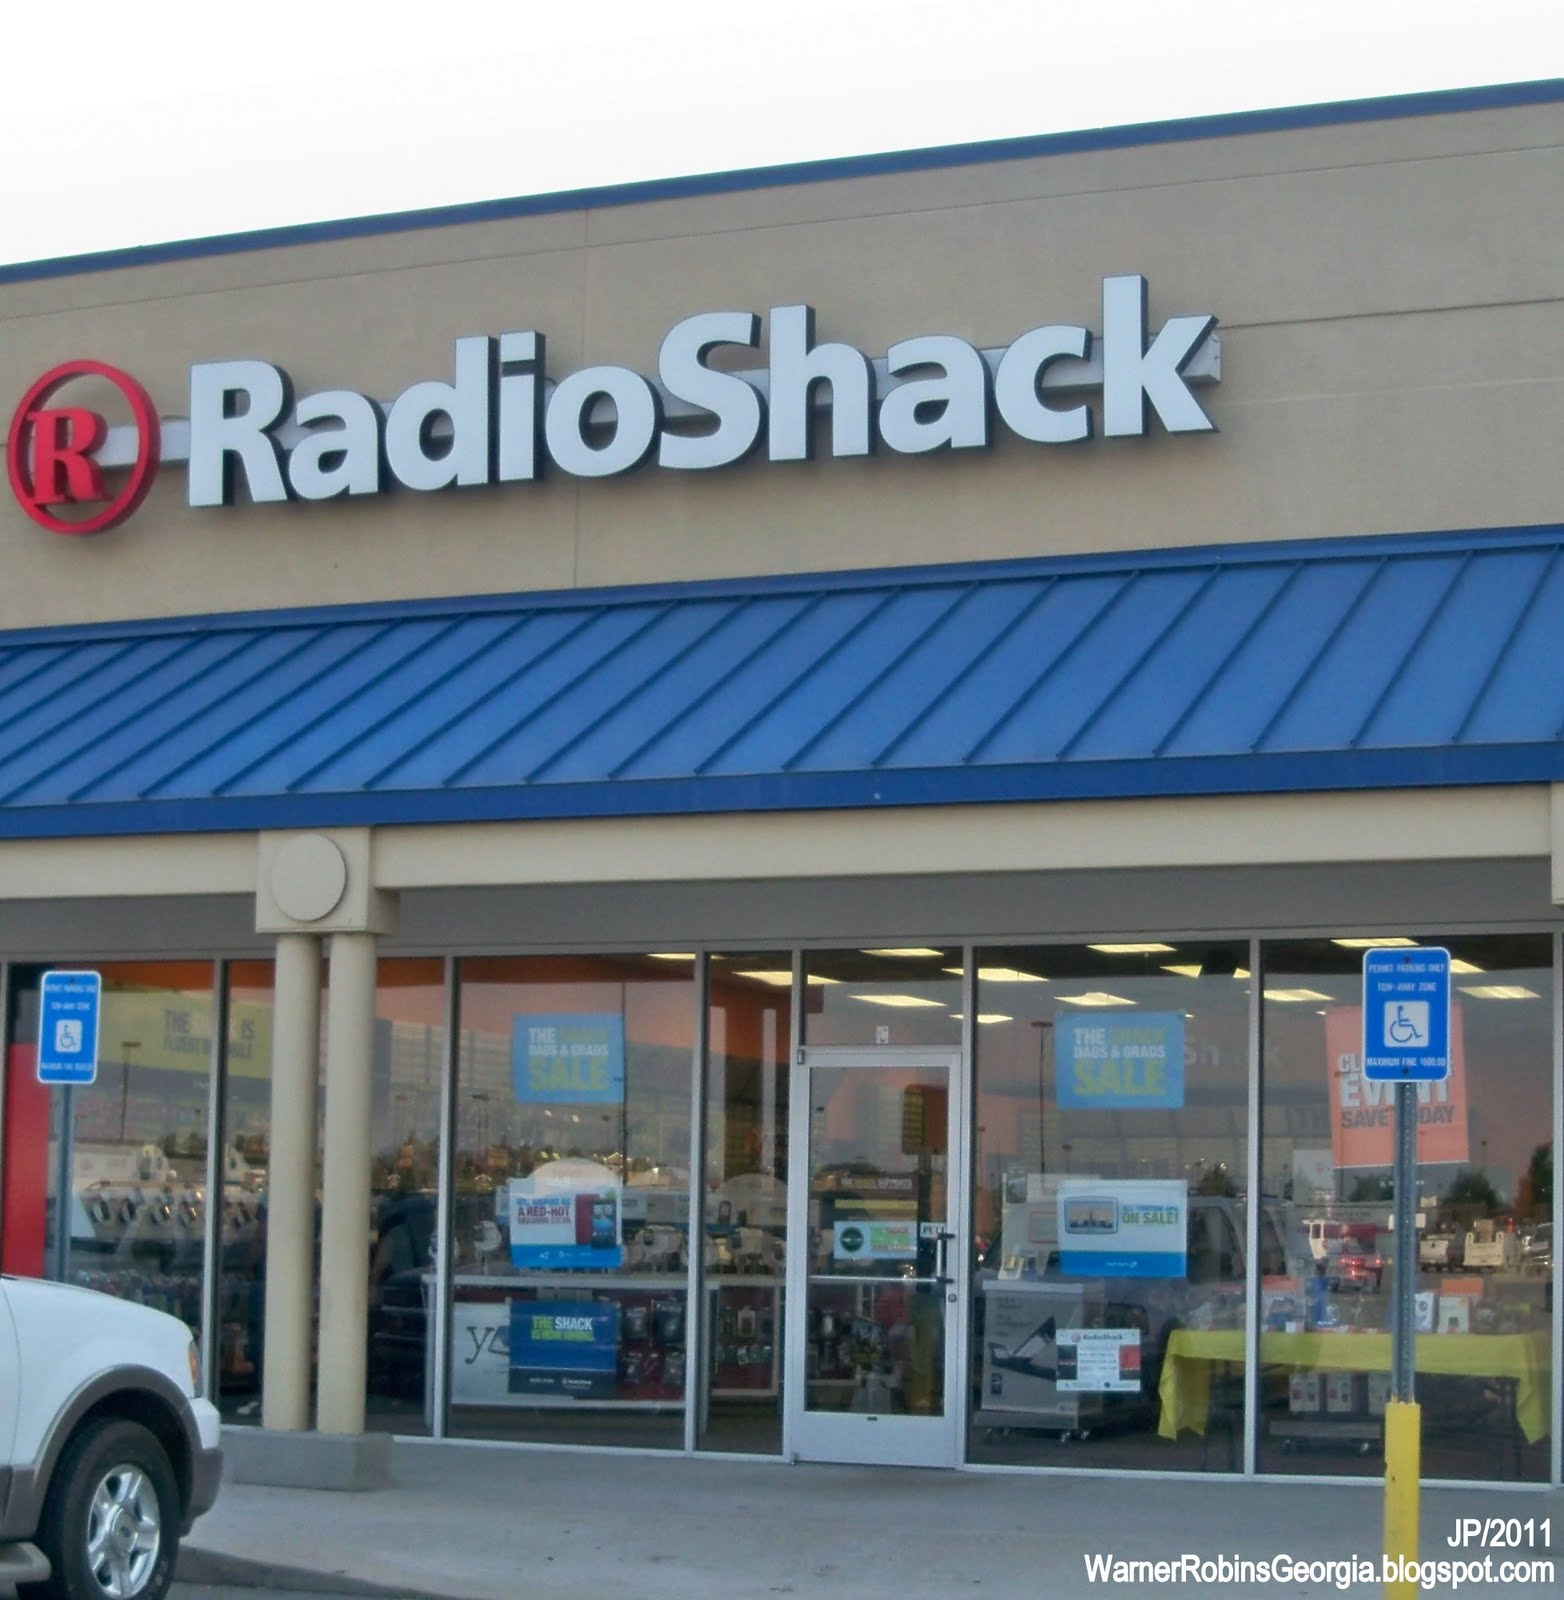 Radio Shack Stores: WARNER ROBINS GEORGIA Air Force Base Houston Restaurant